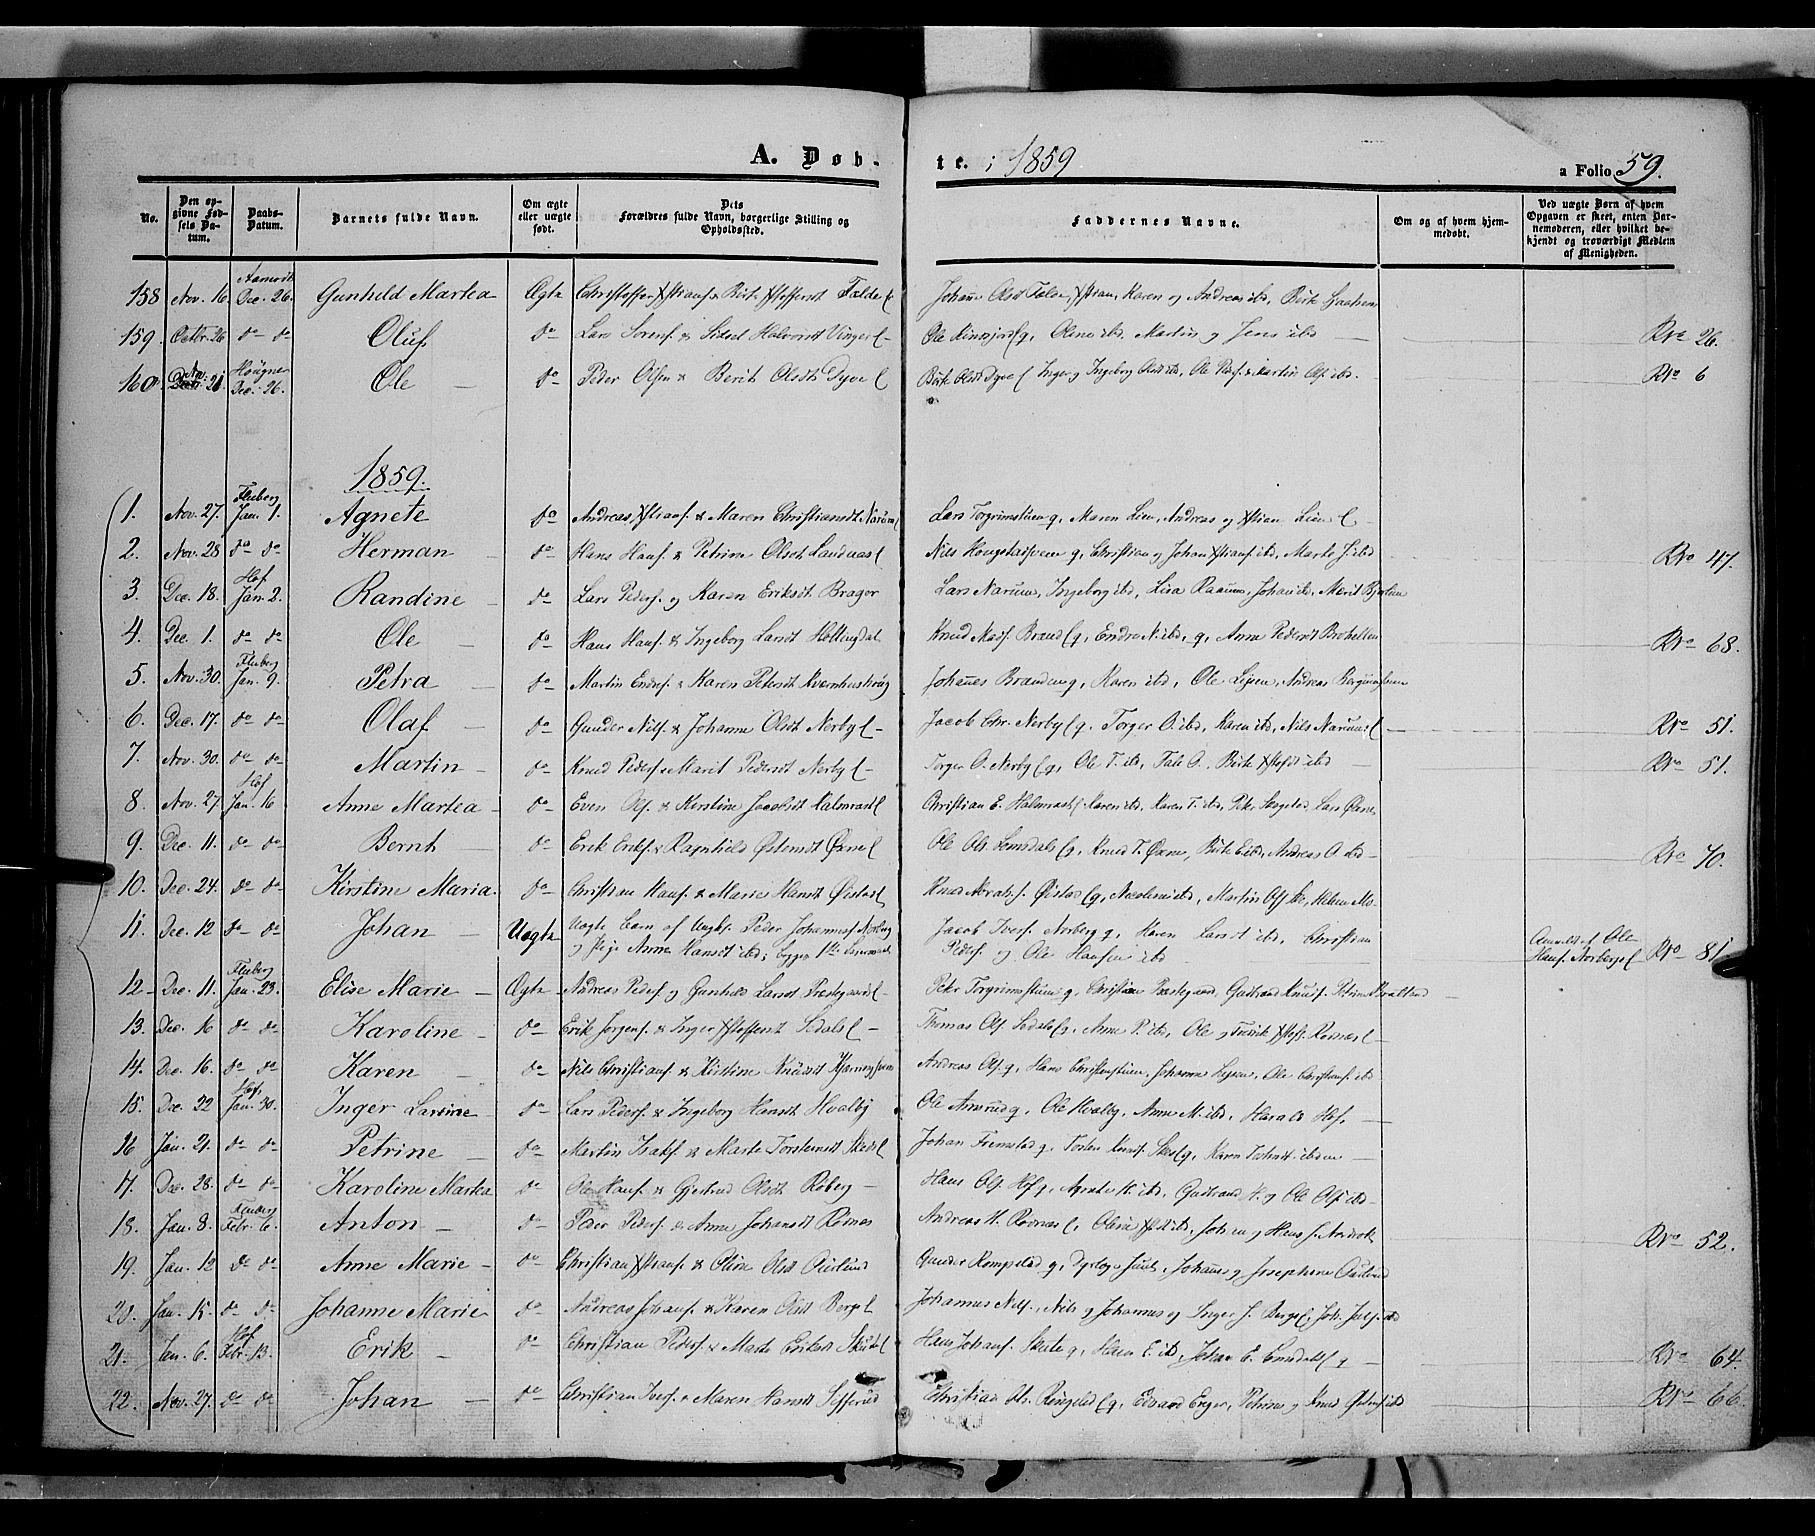 SAH, Land prestekontor, Ministerialbok nr. 10, 1847-1859, s. 59